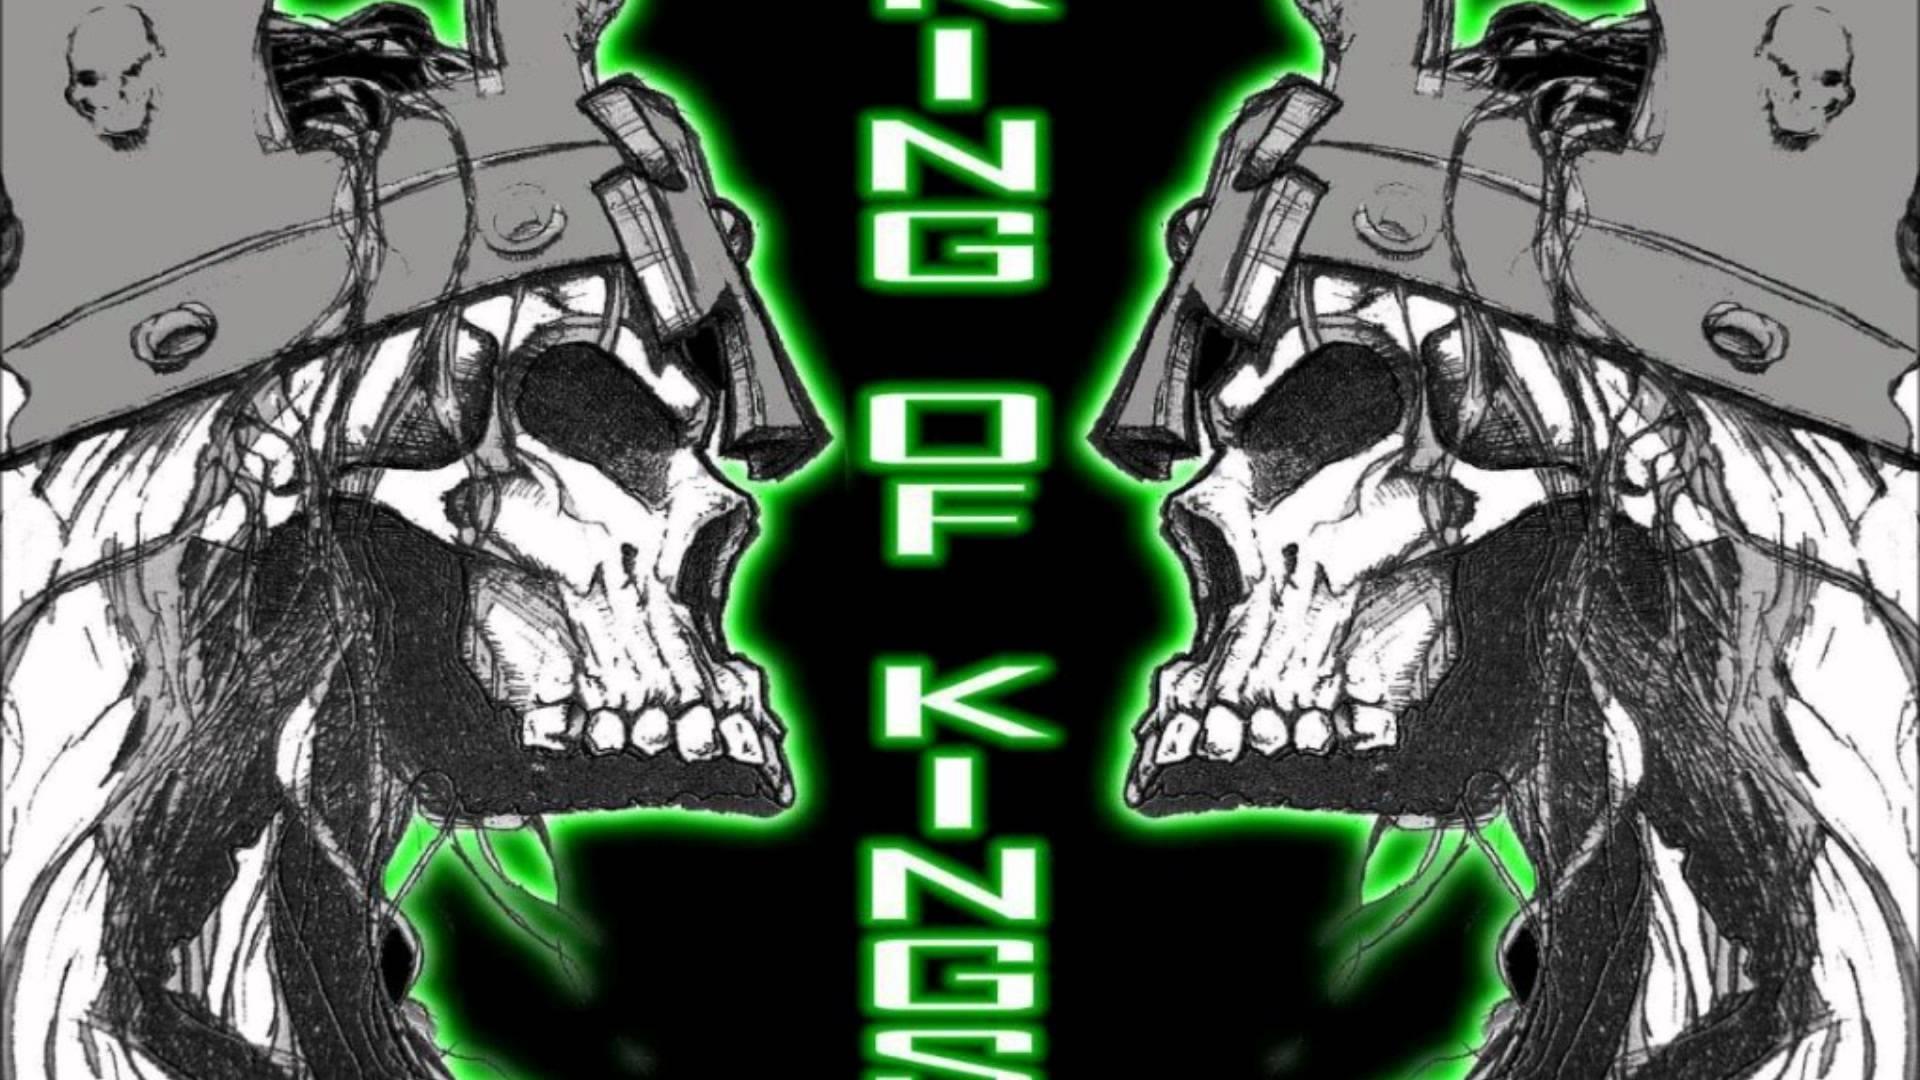 hhh king of kings - youtube